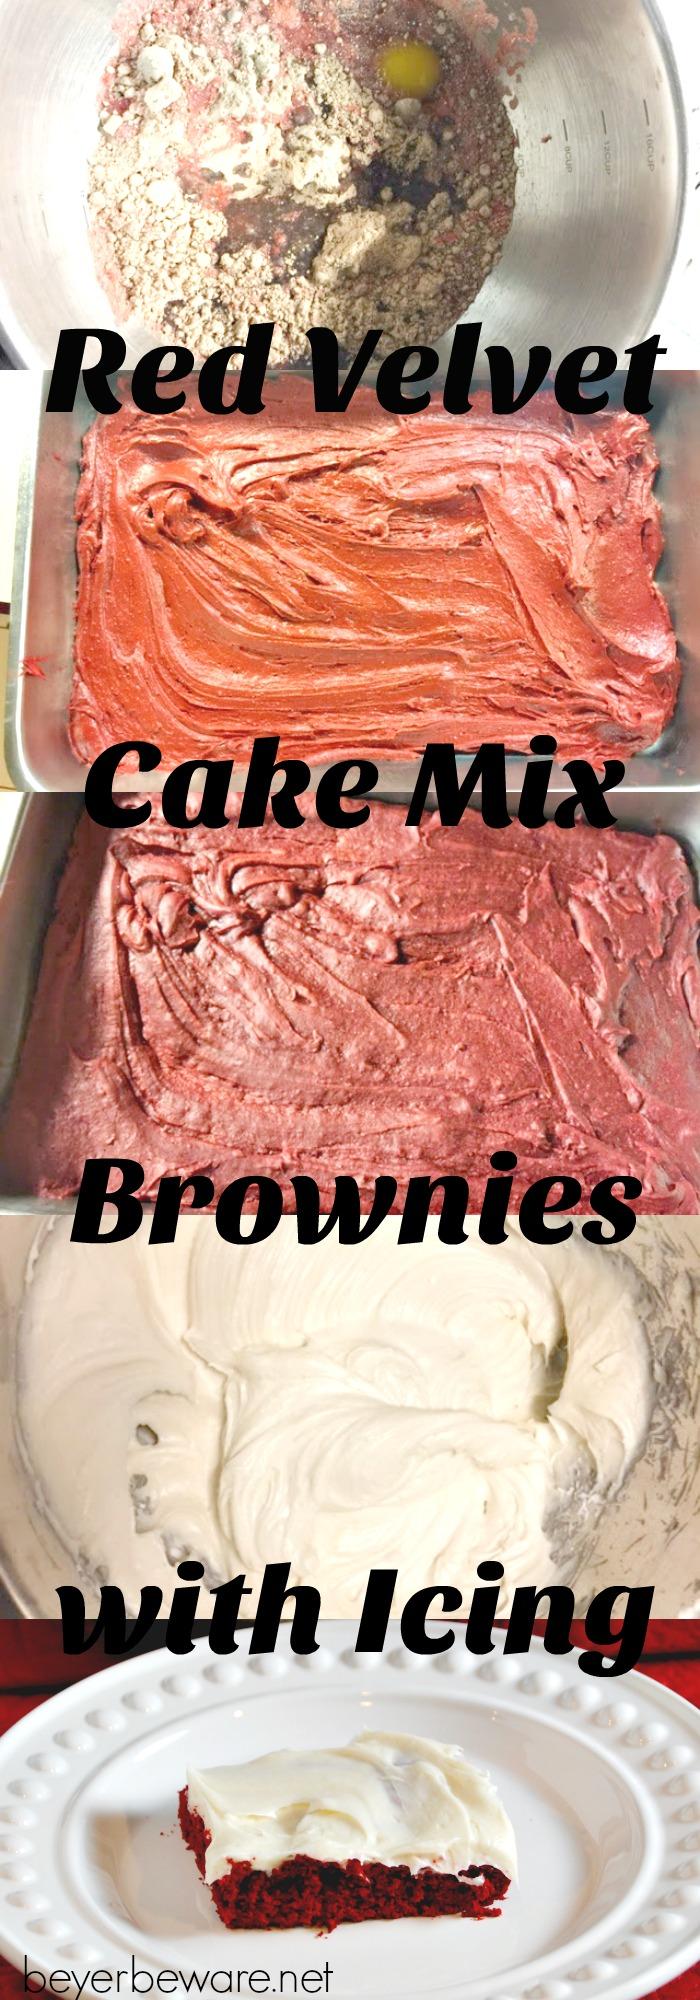 Brownie recipes using red velvet cake mix